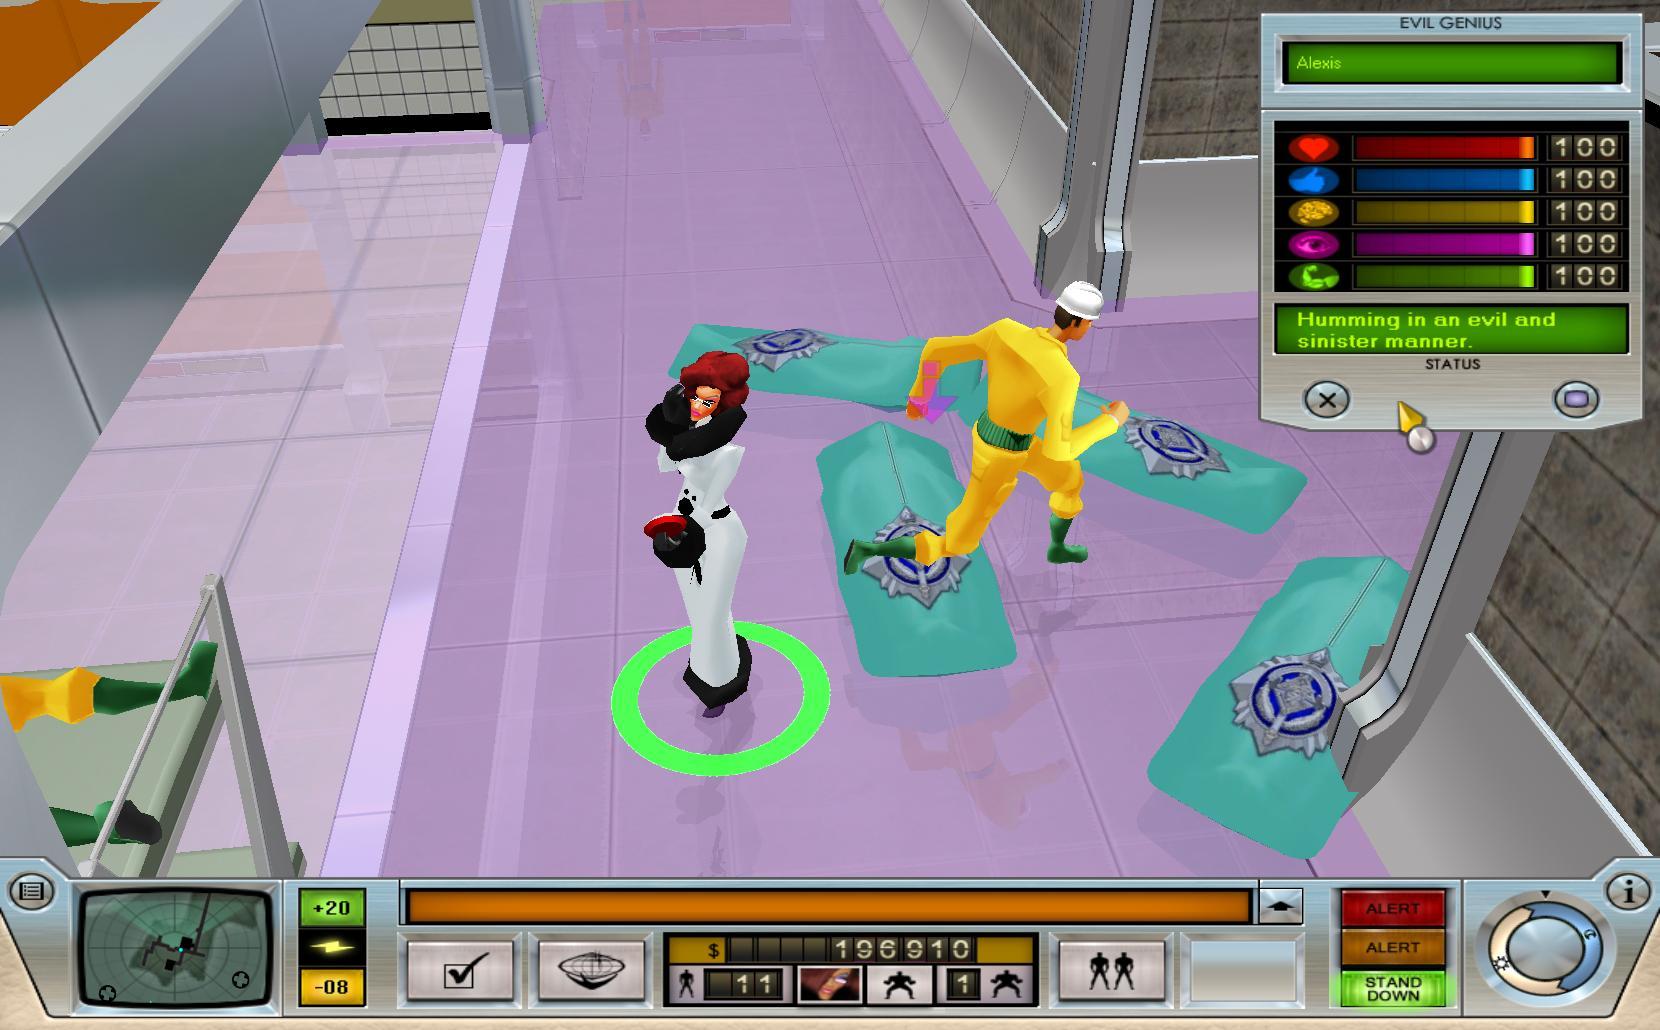 EvilGeniusExeStub-Release 2009-12-05 02-02-10-65